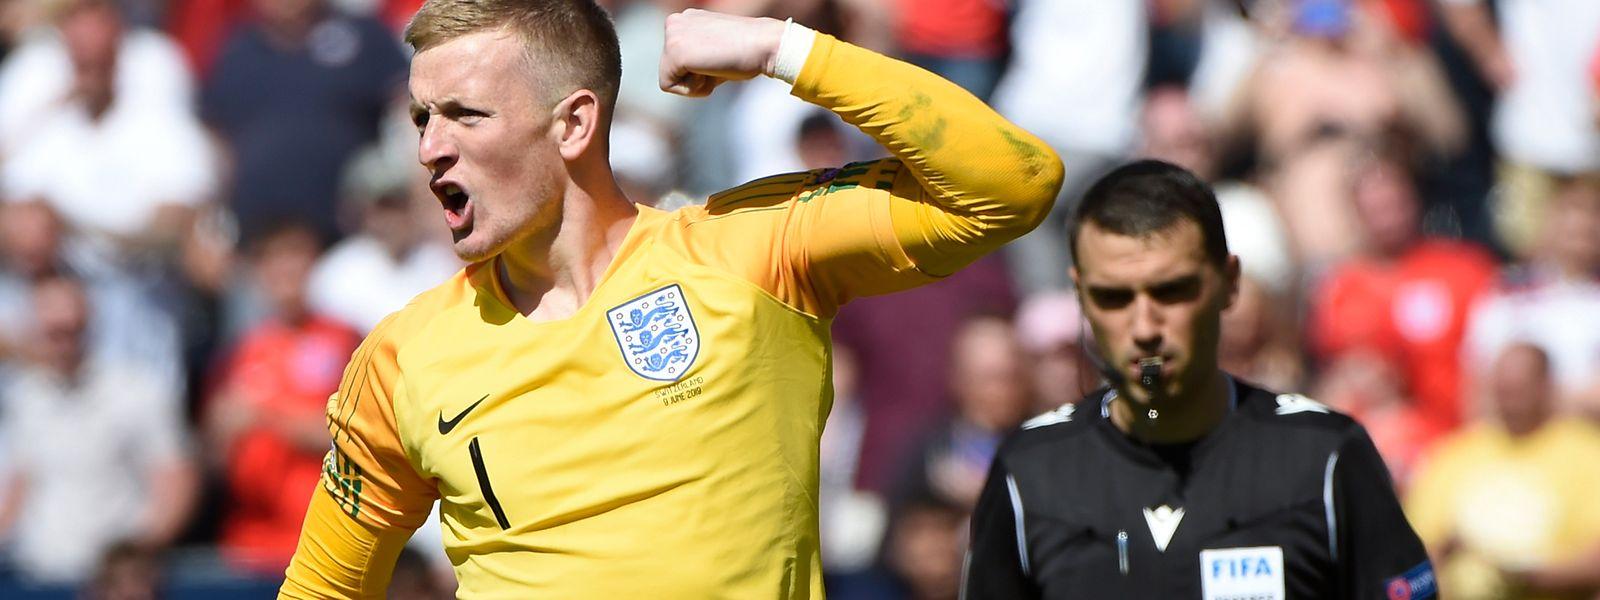 Jordan Pickford, guarda-redes inglês, foi preponderante na vitória da Inglaterra frente à Suíça.